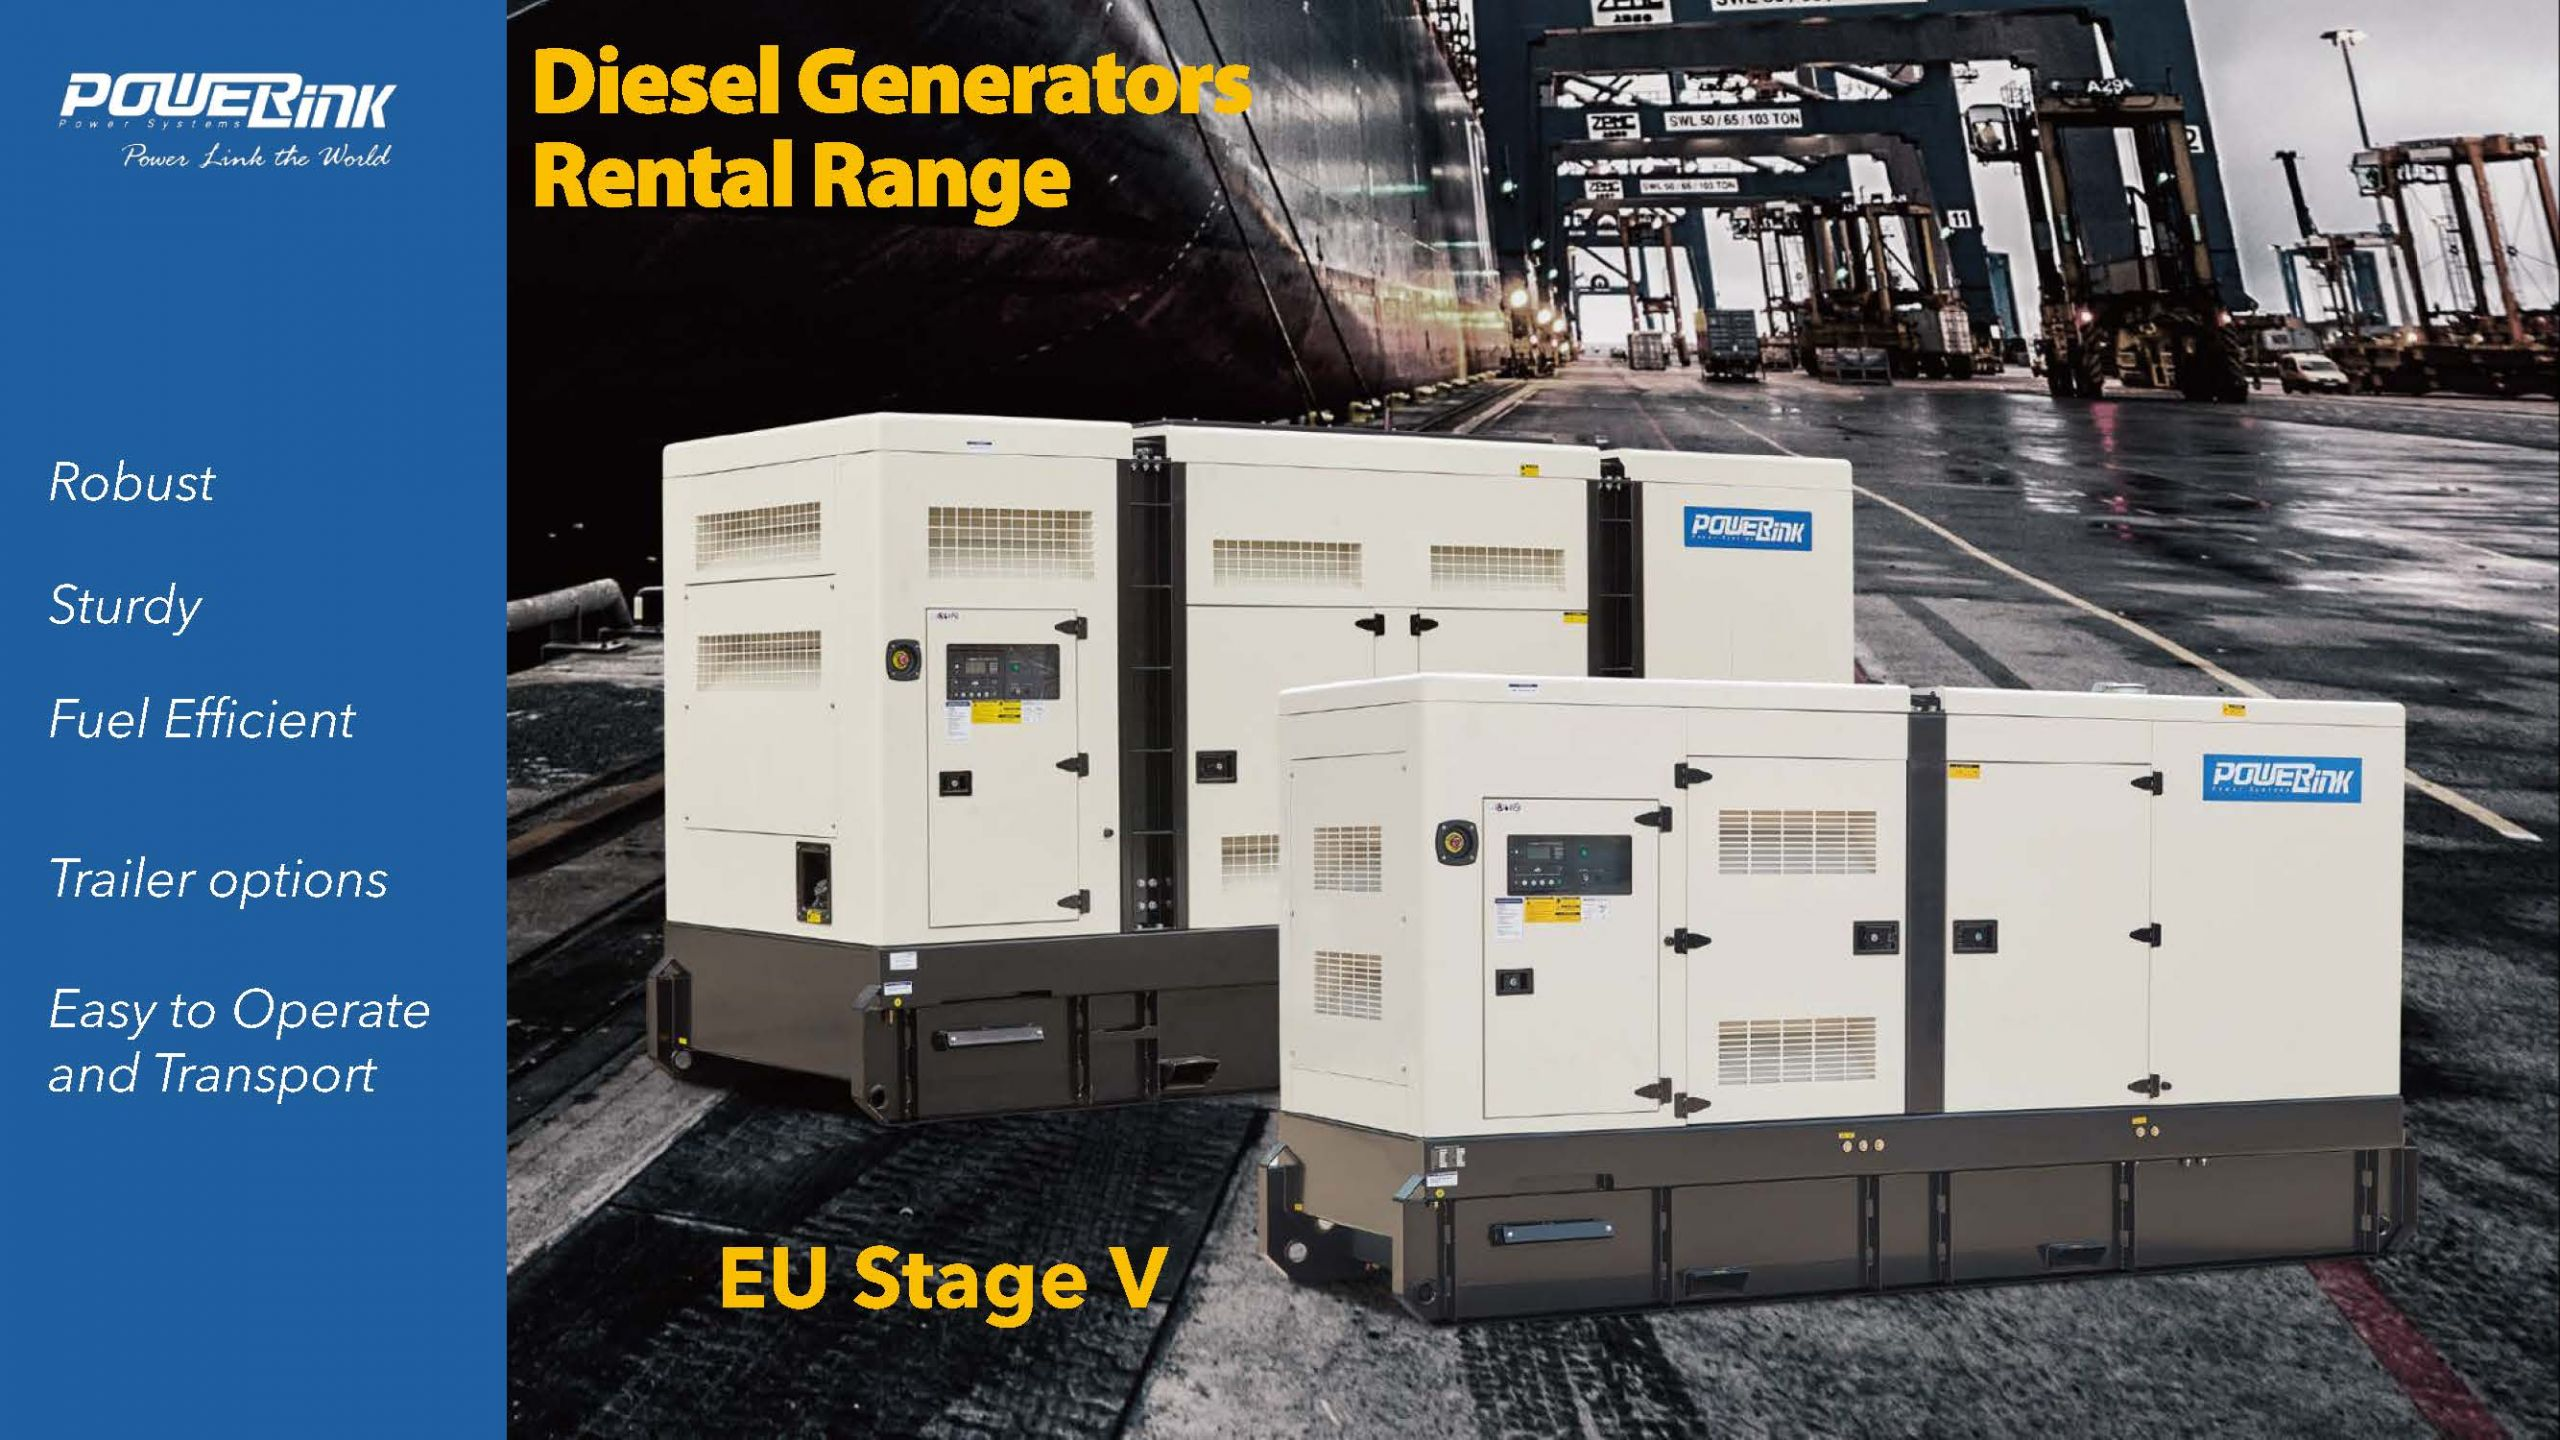 PowerLink EU Stage V 1.2 diesel generator intro(for website)_Page_01